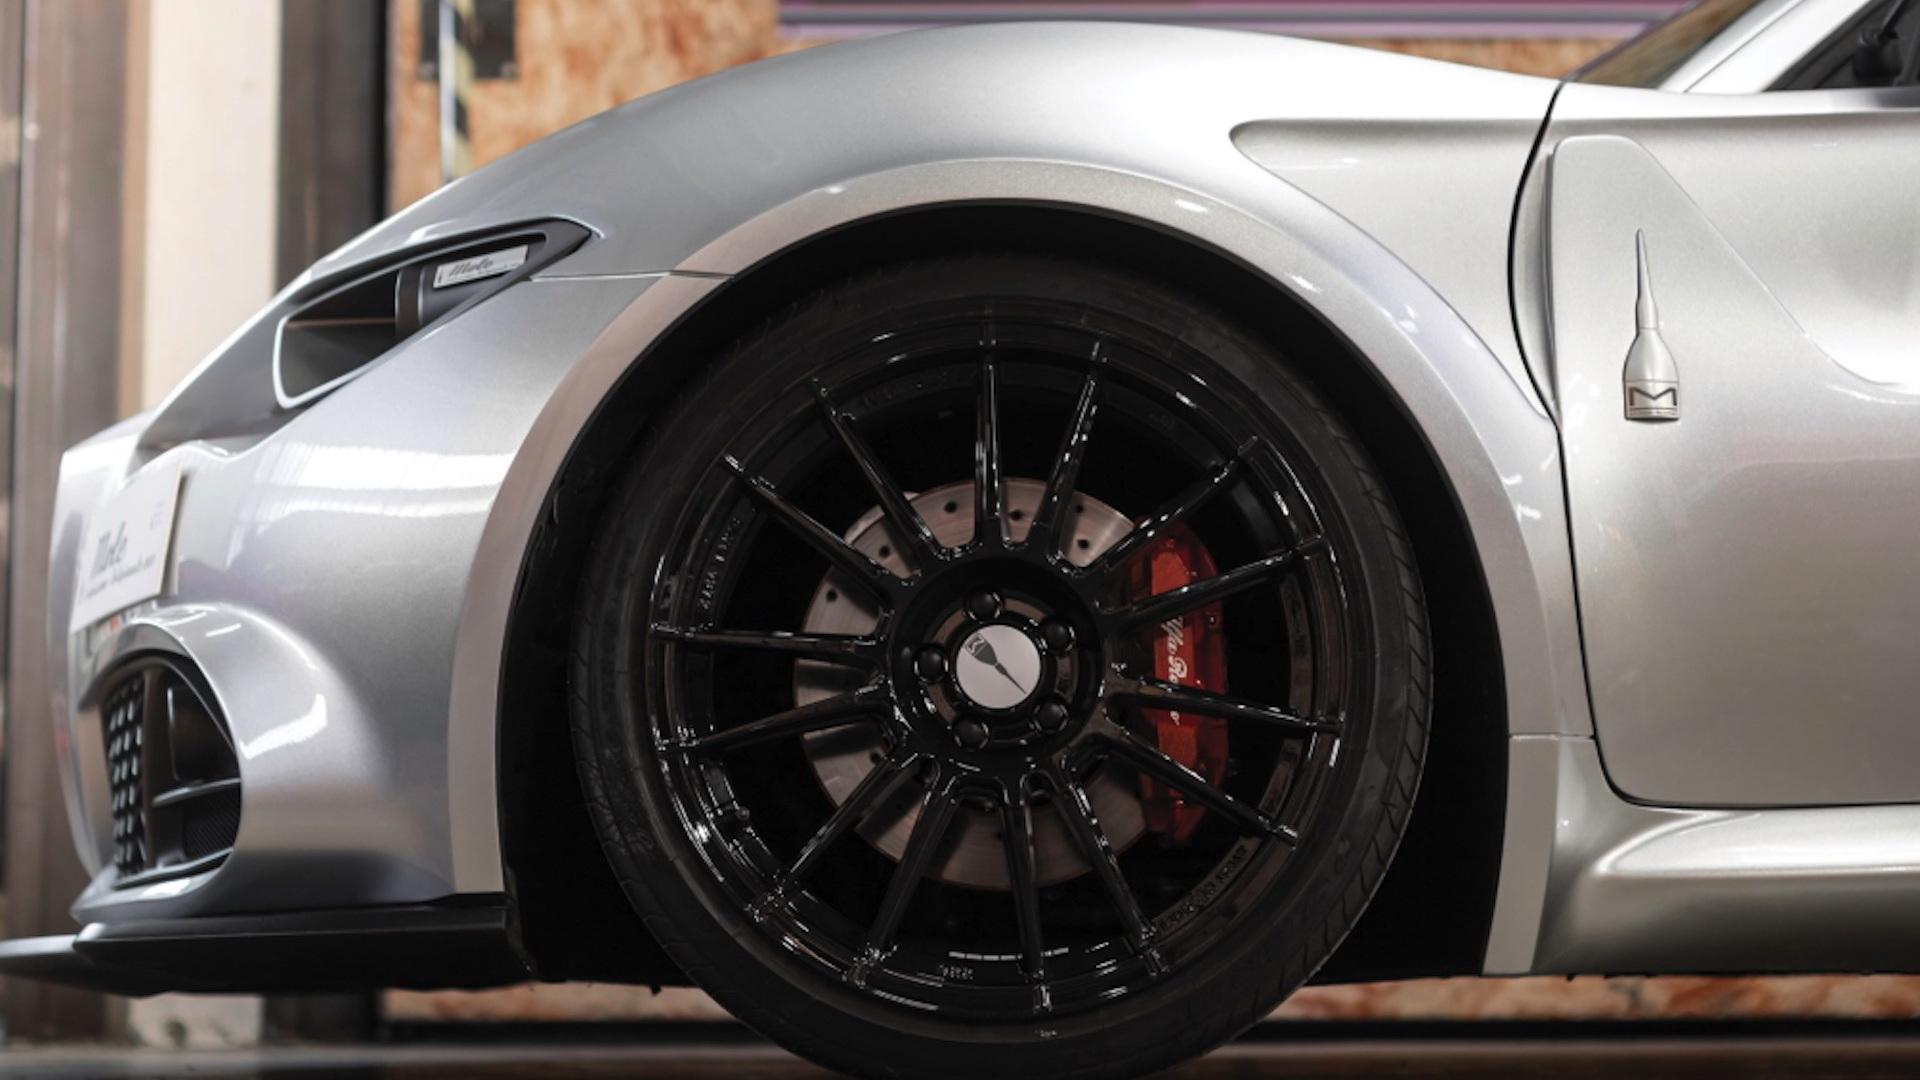 Mole coachbuilt Alfa Romeo 4C